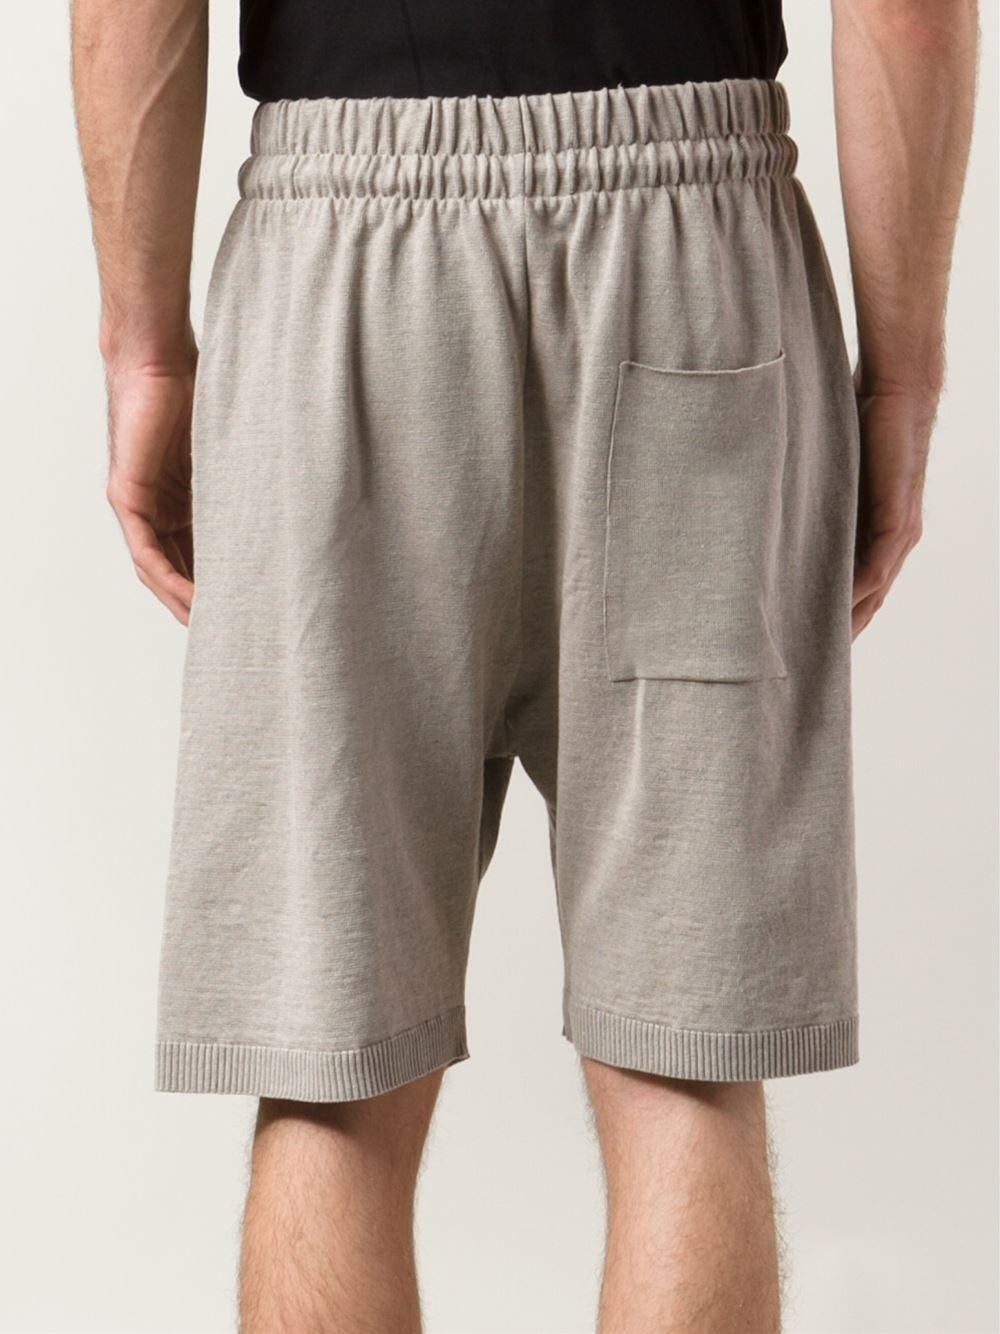 Daniel Andresen Drop-Crotch Shorts In Natural For Men  Lyst-4323